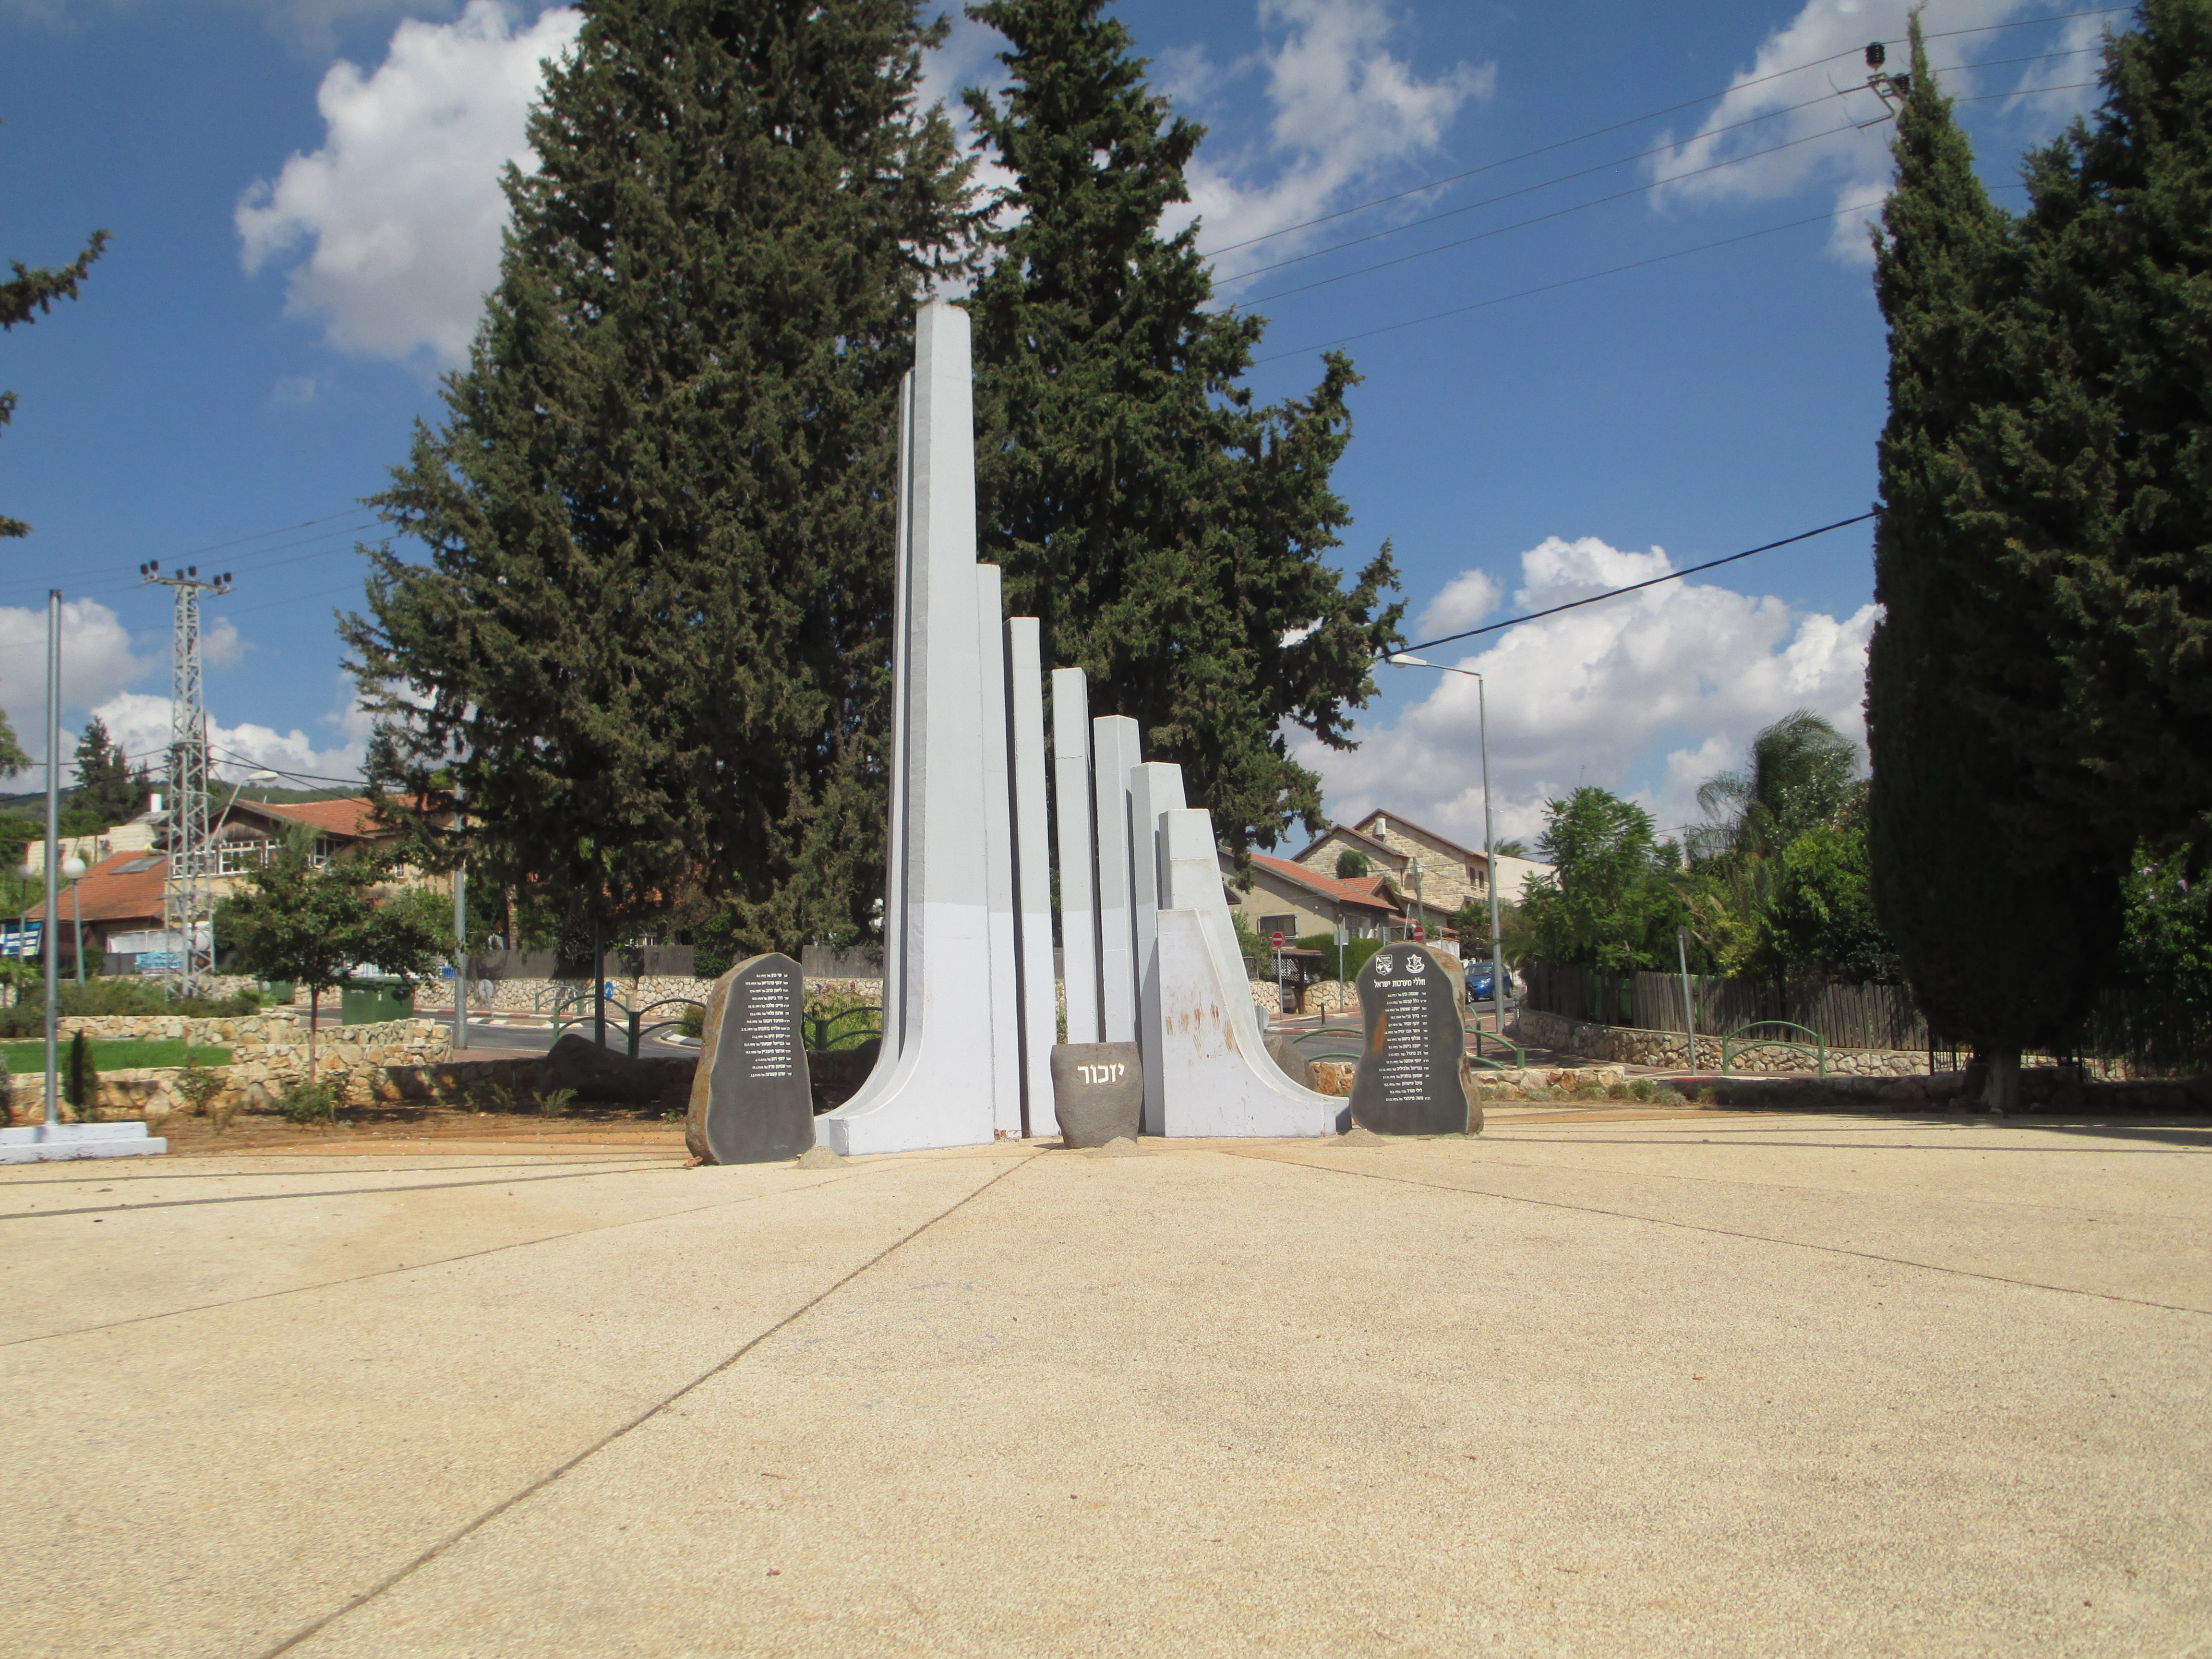 Hatzor Haglilit Israel  city pictures gallery : פיקיוויקי – מאגר תמונות שיתופי לשימוש ...